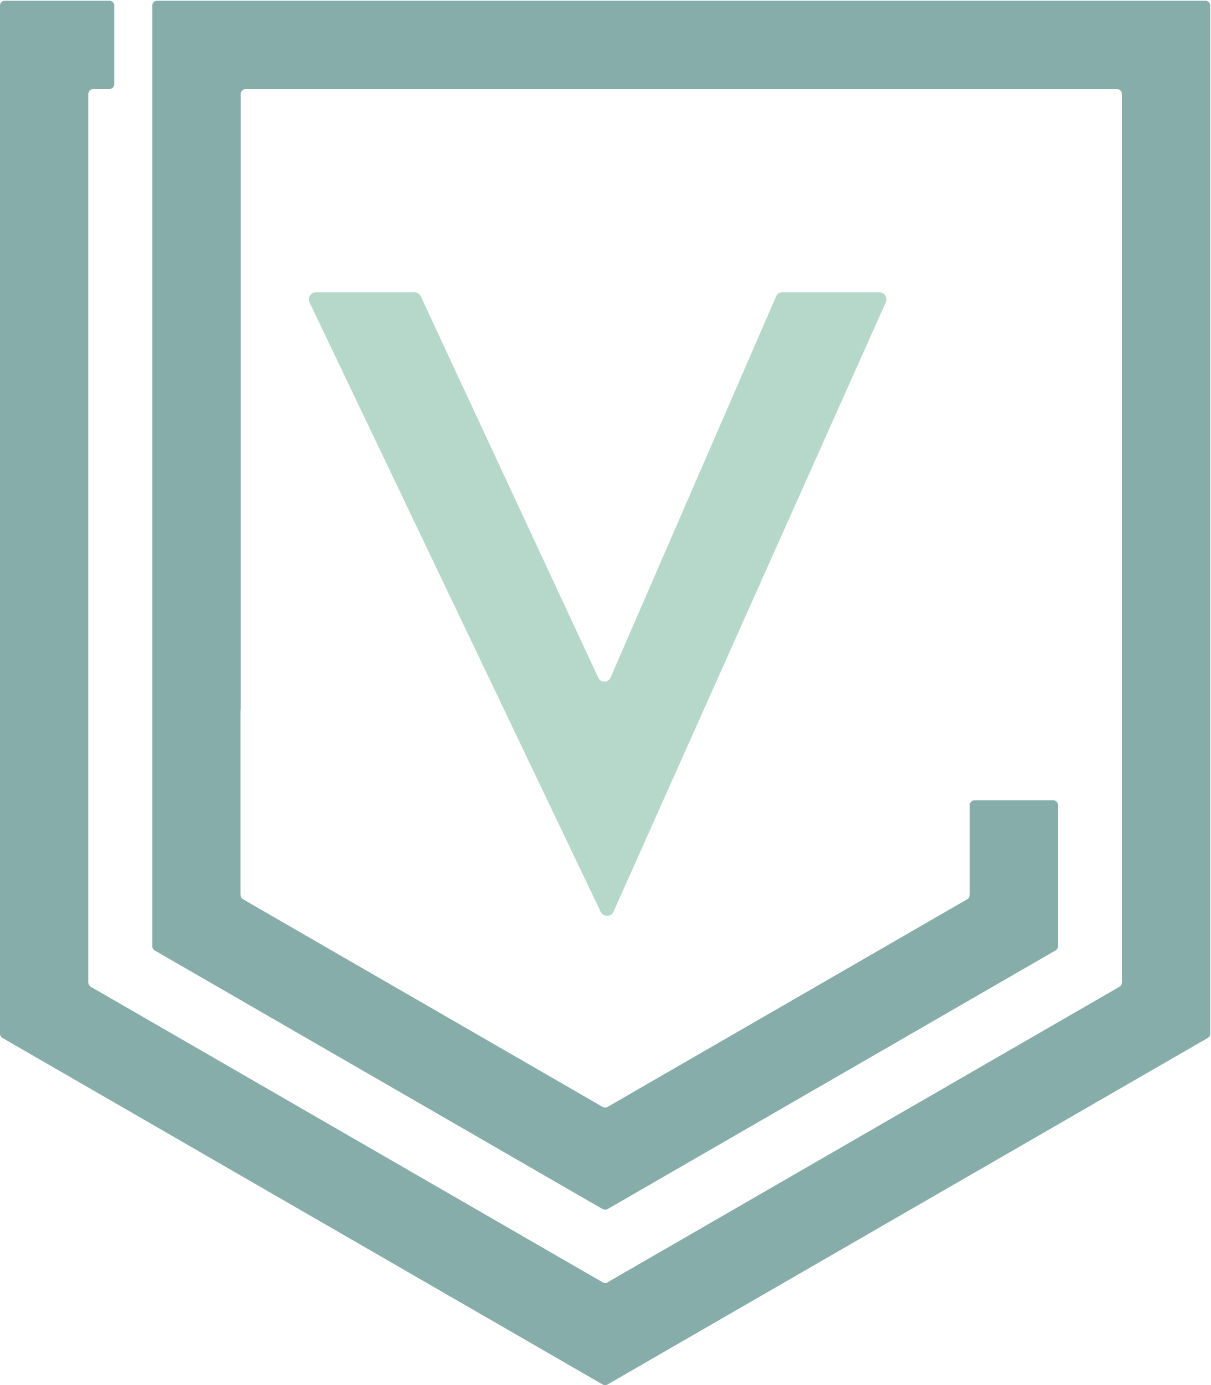 Pocket vCard